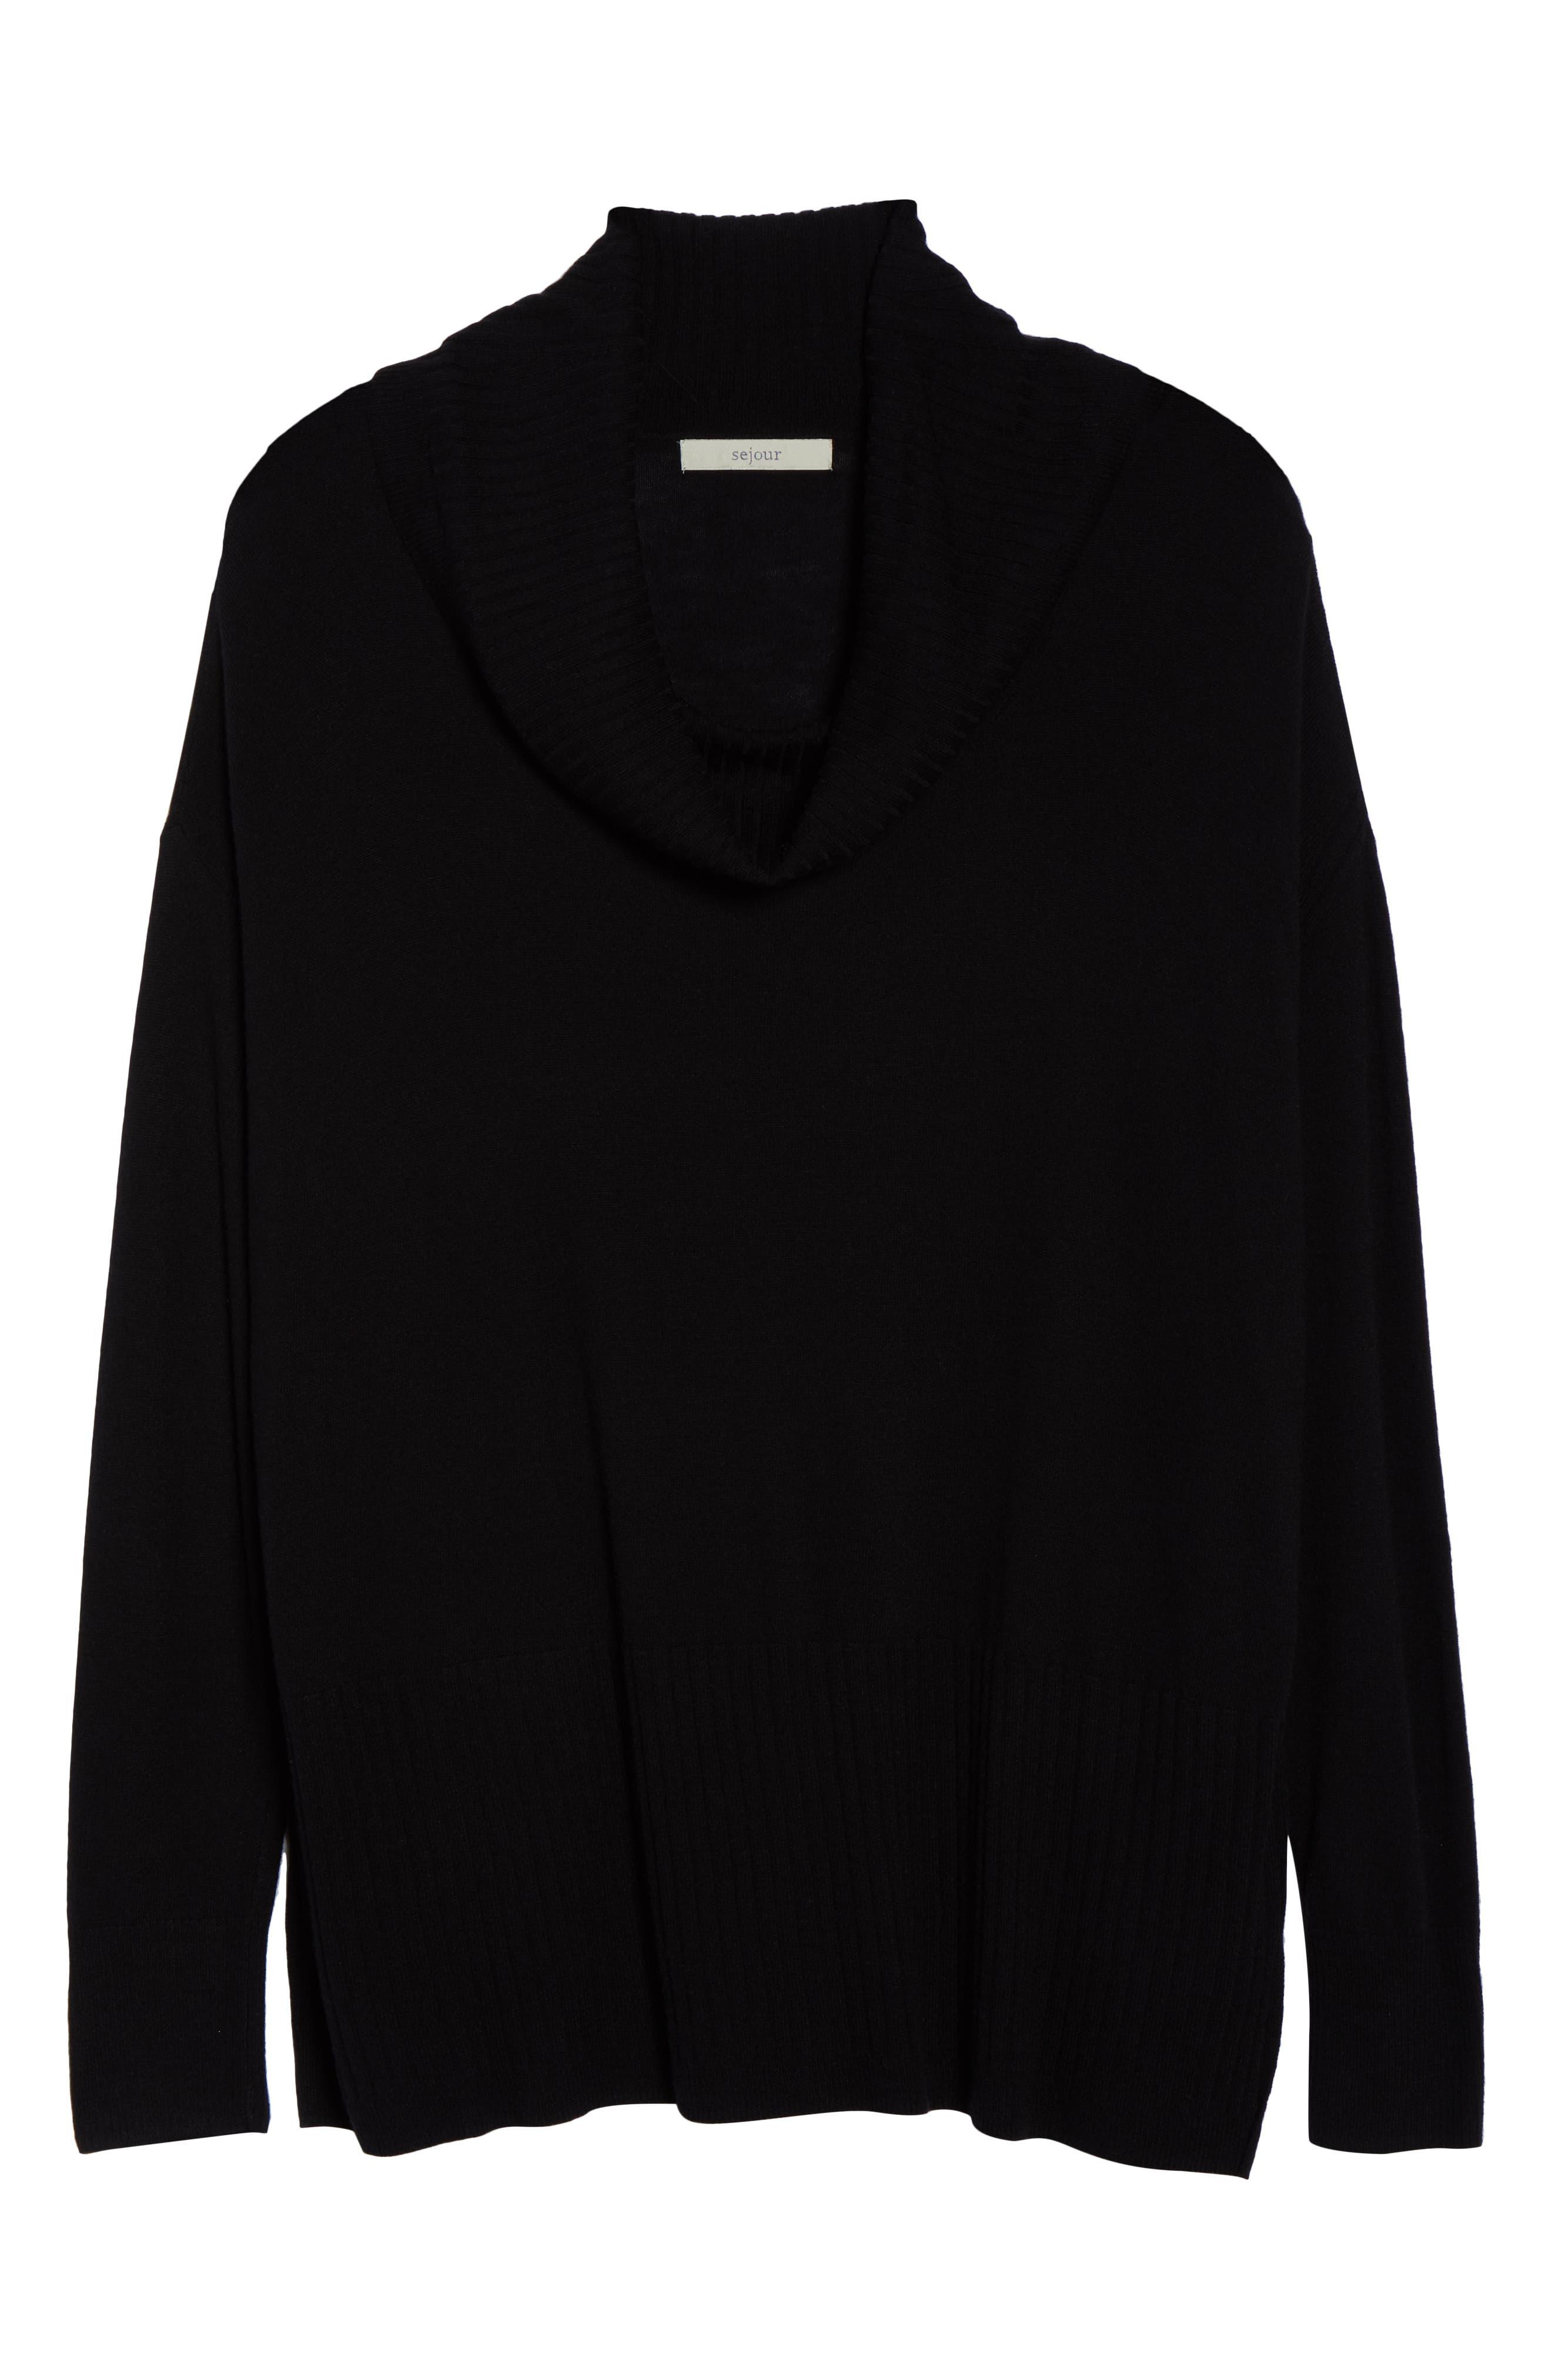 SEJOUR,                             Cowl Neck Pullover,                             Alternate thumbnail 6, color,                             BLACK